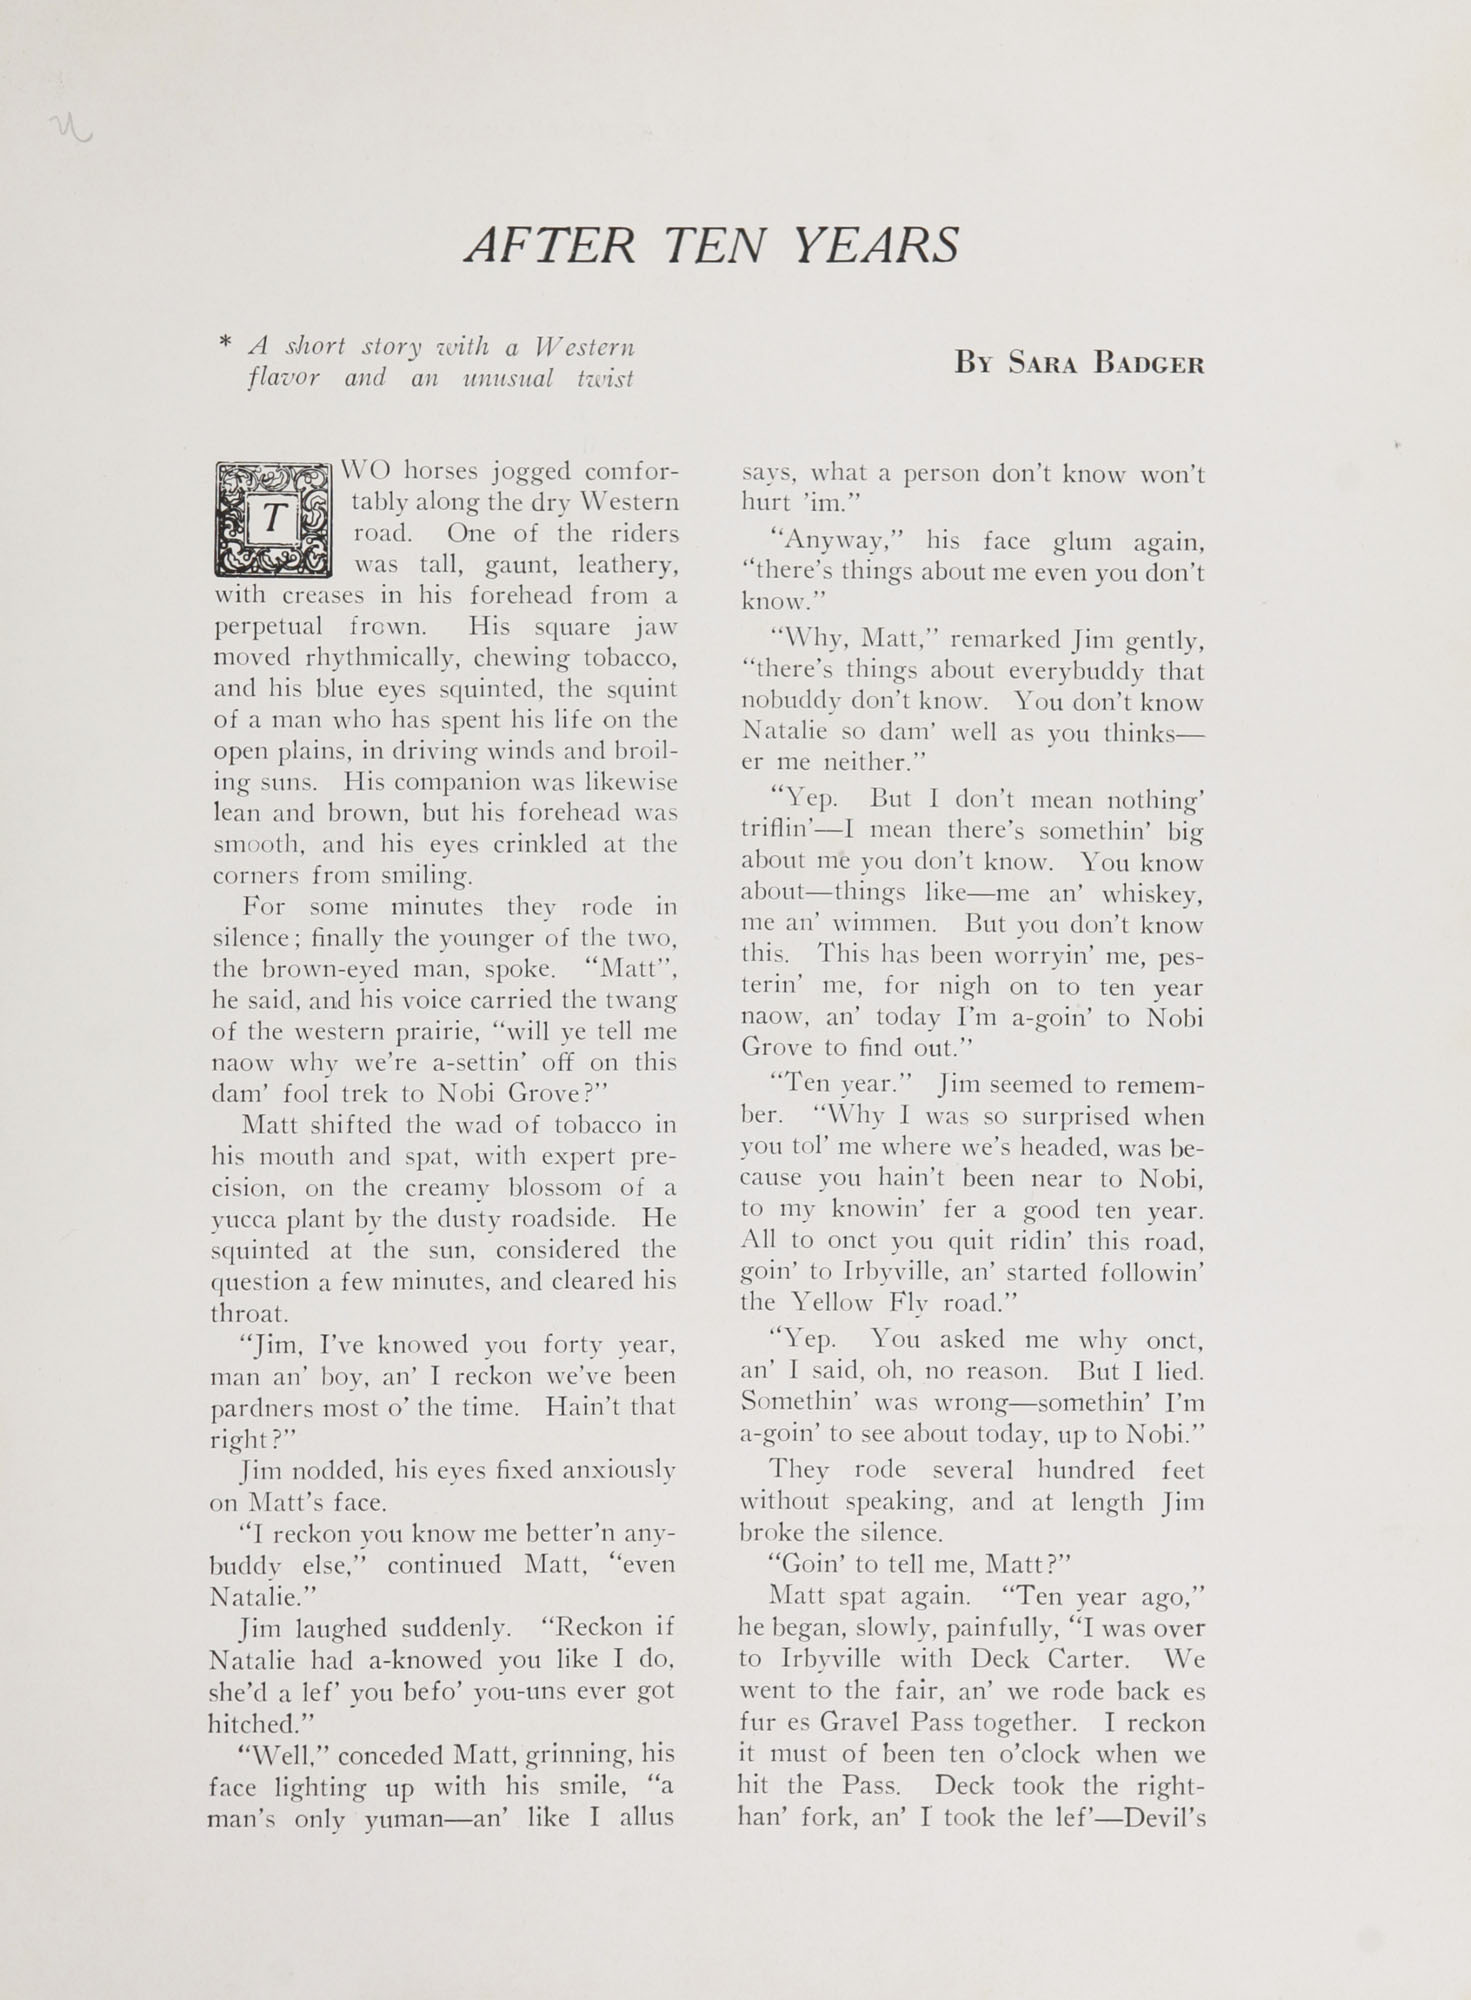 College of Charleston Magazine, 1938-1939, Vol. XXXXII No. 1, page 3